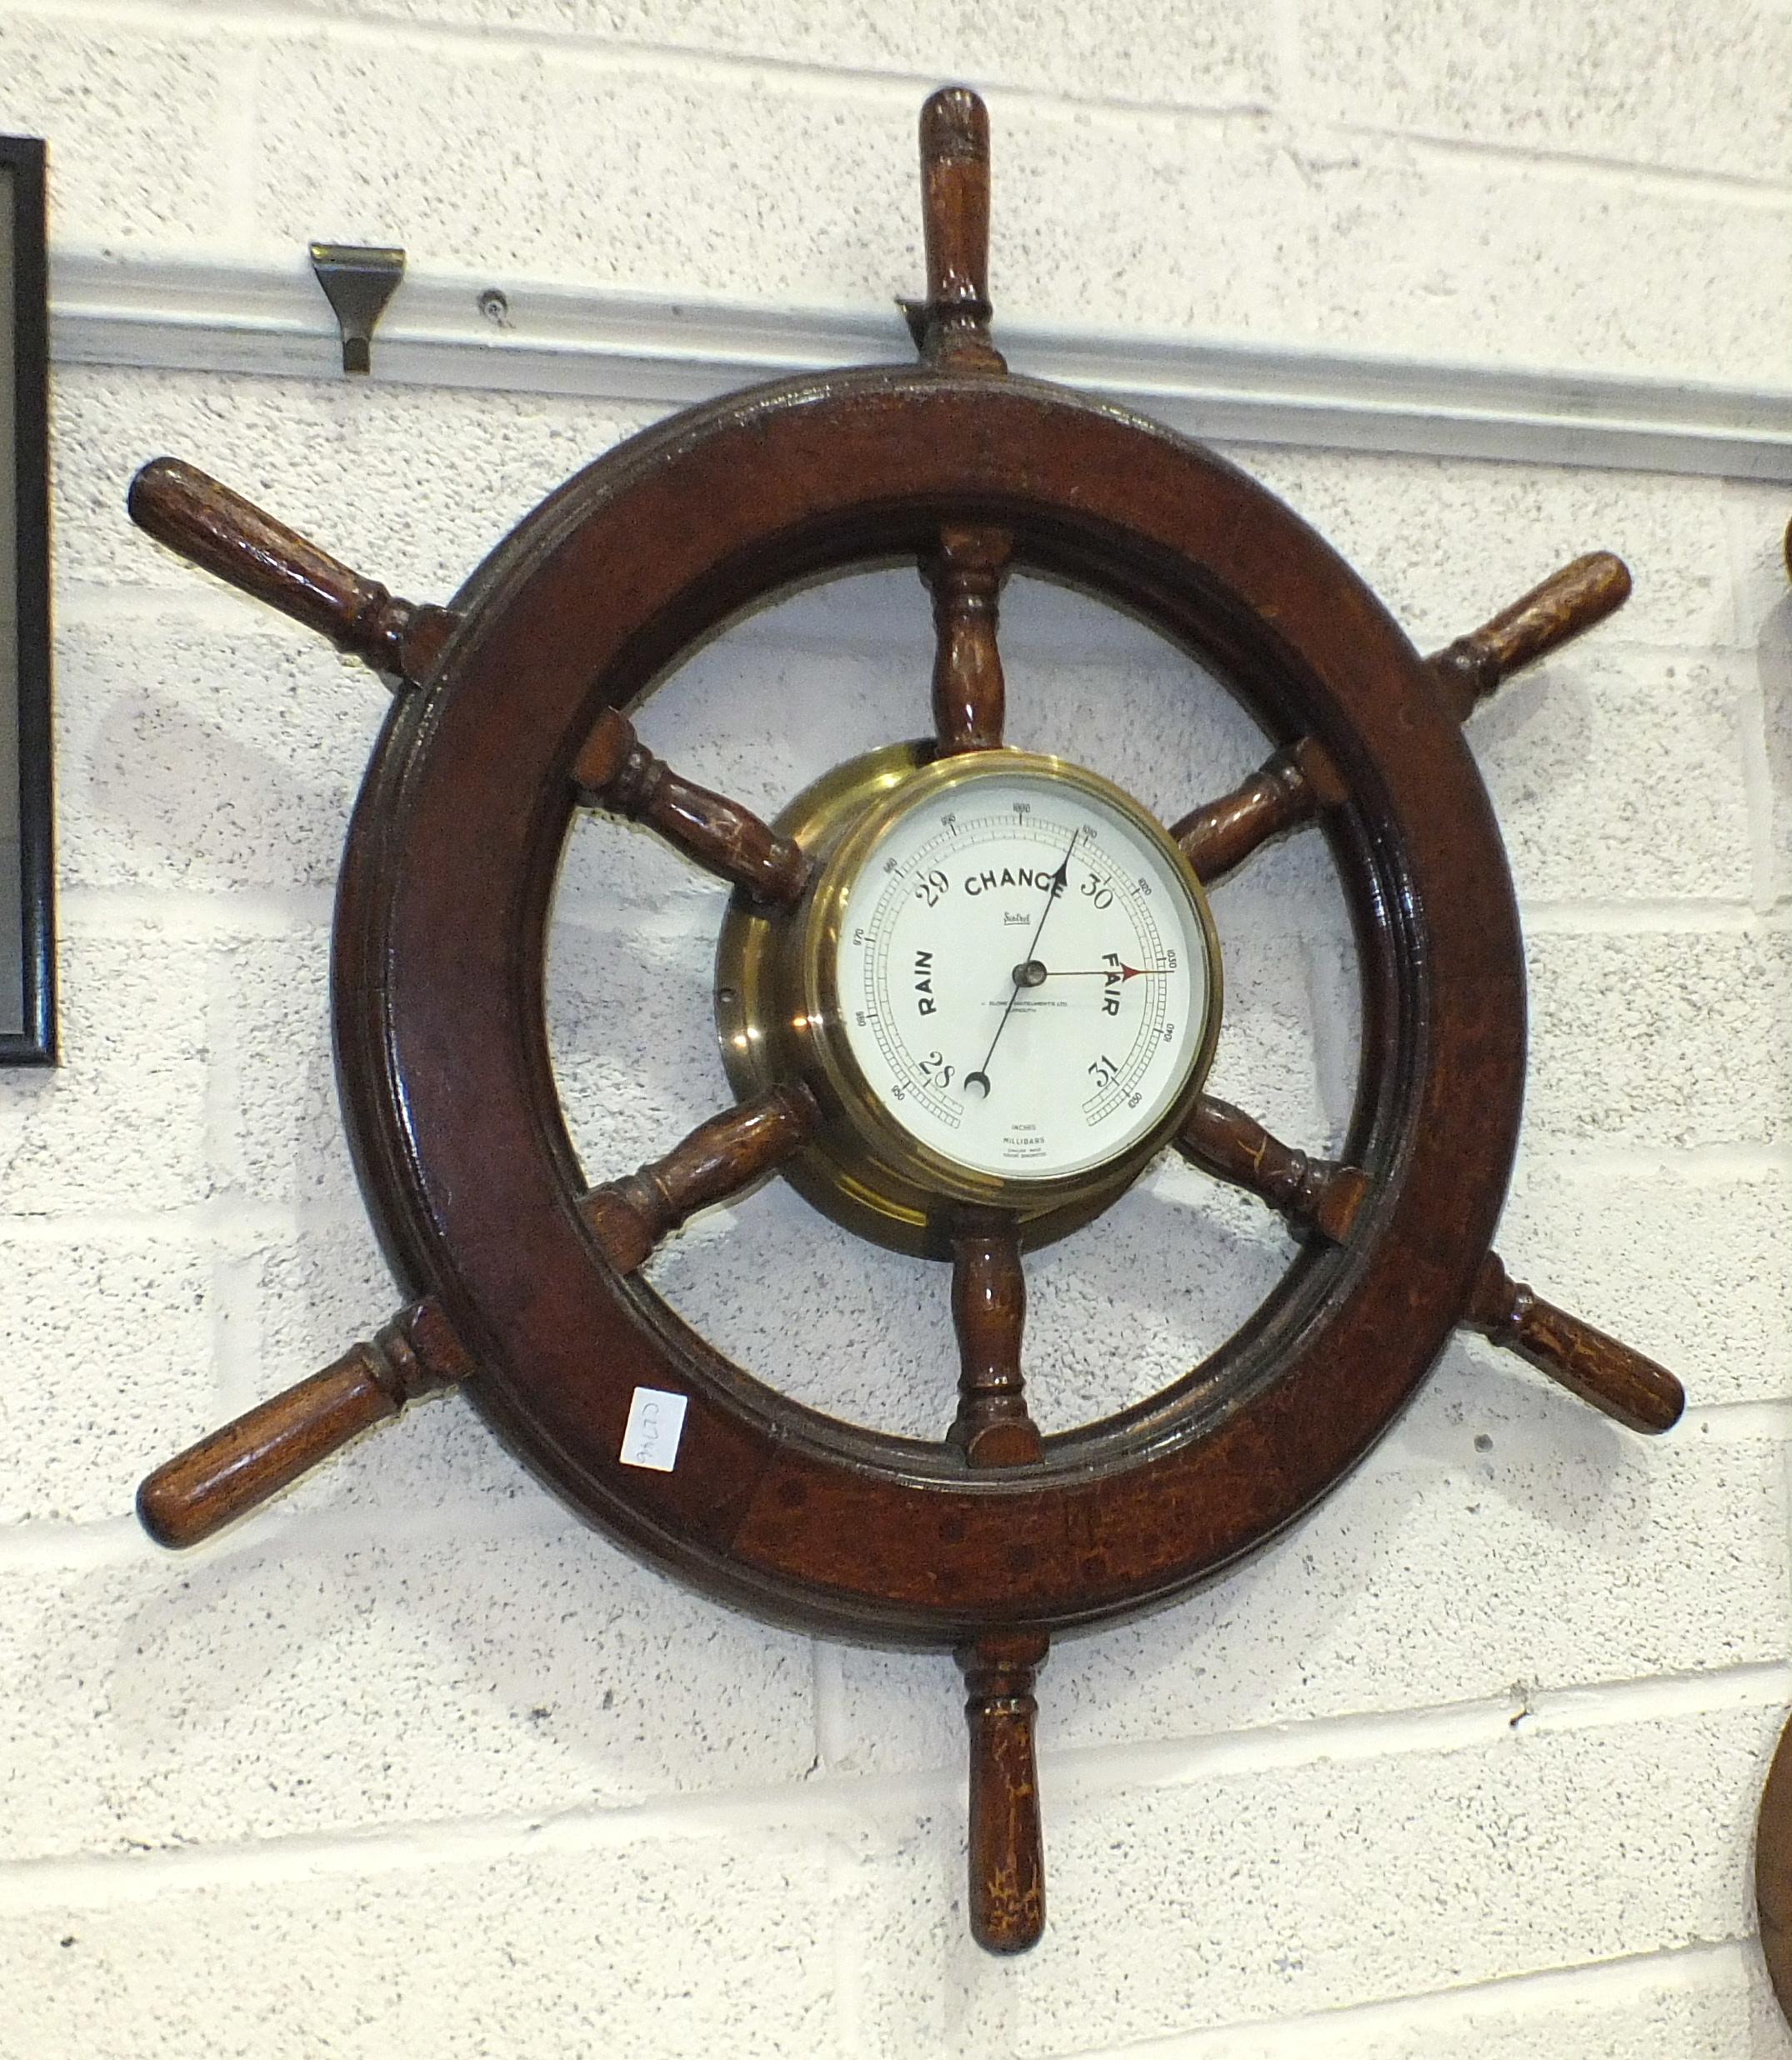 A Sestrel brass bulkhead barometer, 19cm diameter, set within a wooden ship's wheel, 71cm overall.